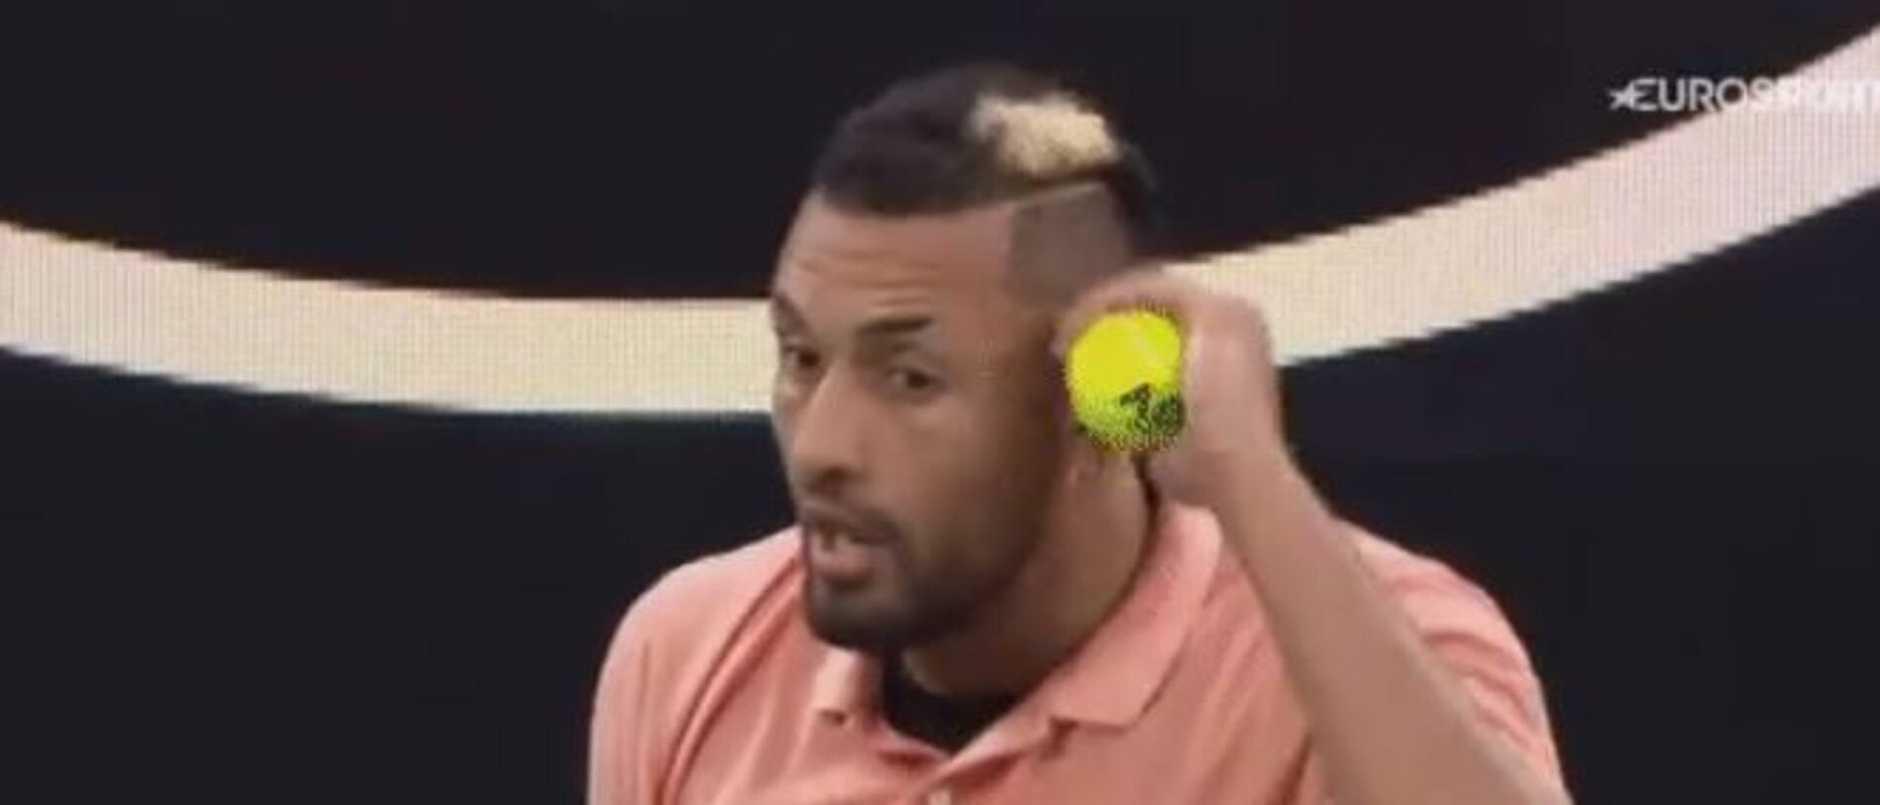 Nick Kyrgios mocks Rafael Nadal's service routine.